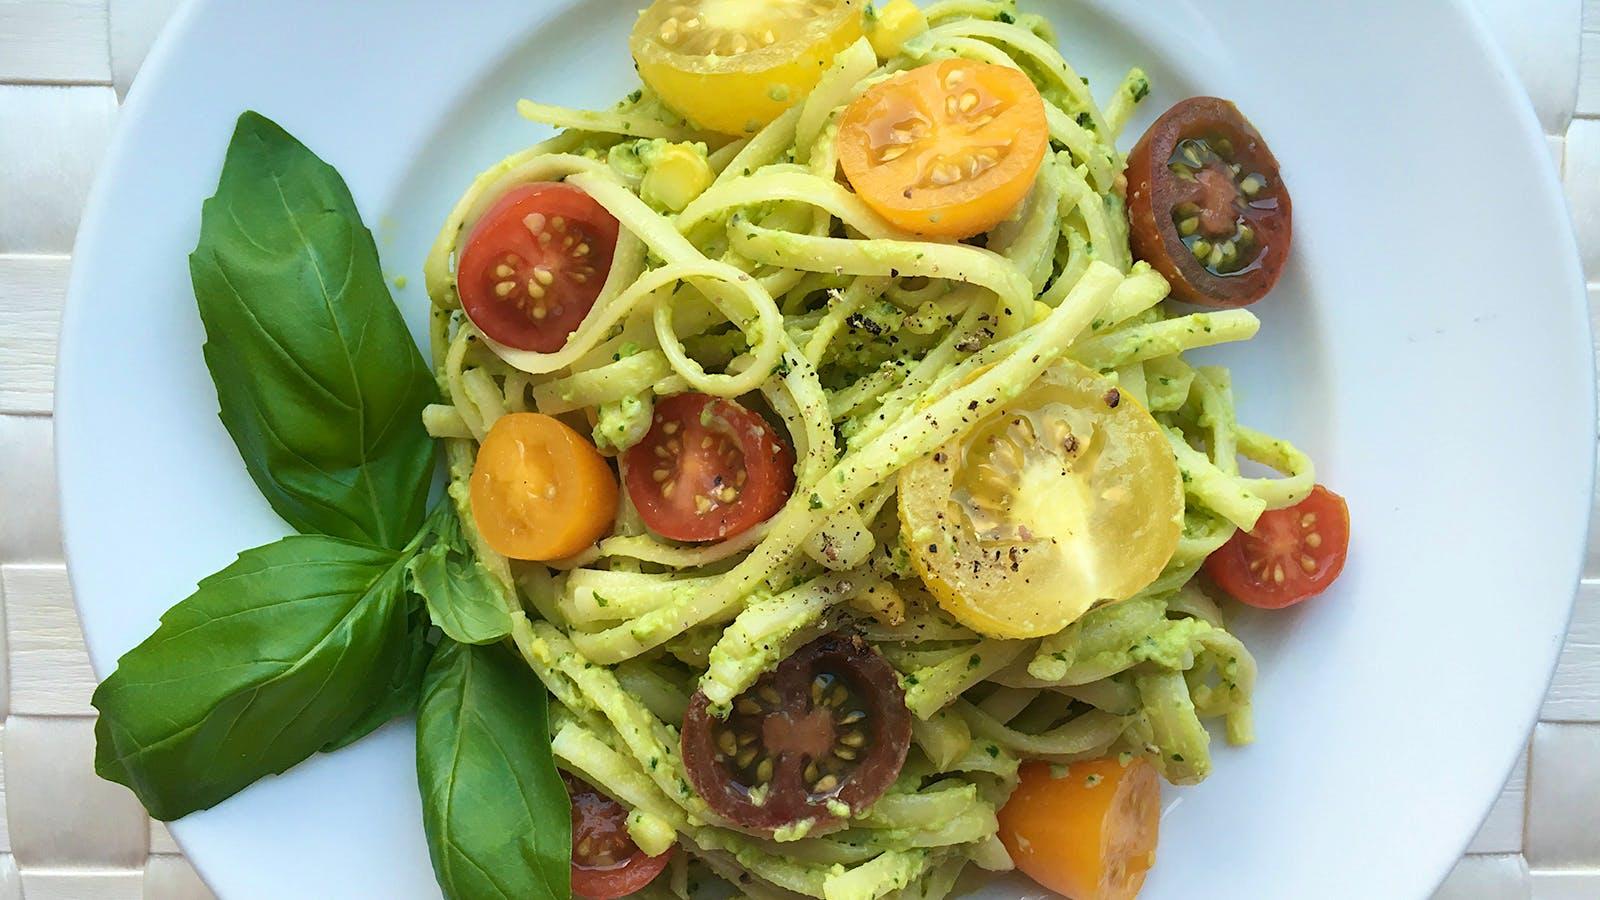 8 & $20: Avocado-Basil Pasta with a Creamy Italian White